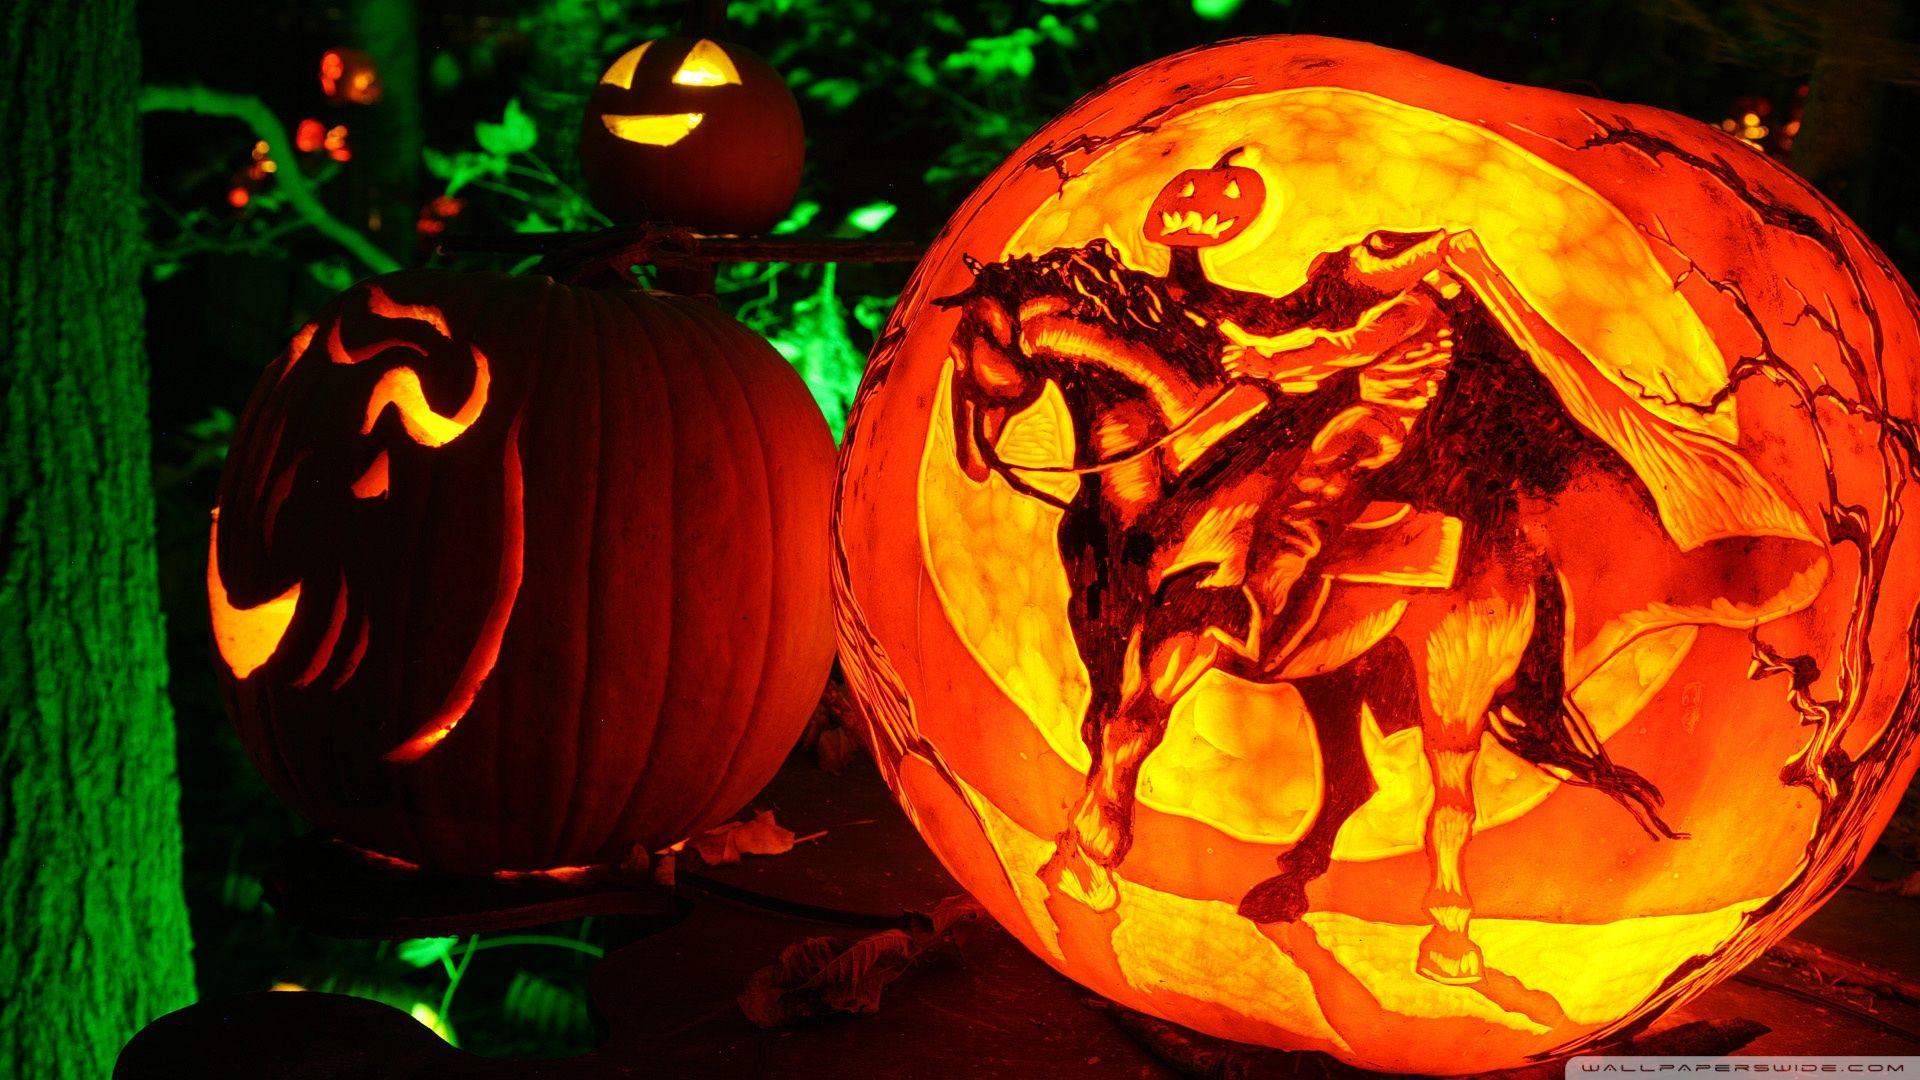 Jack O Lantern Wallpaper Widescreen Halloween Desktop Wallpaper Halloween Wallpaper Backgrounds Halloween Pictures